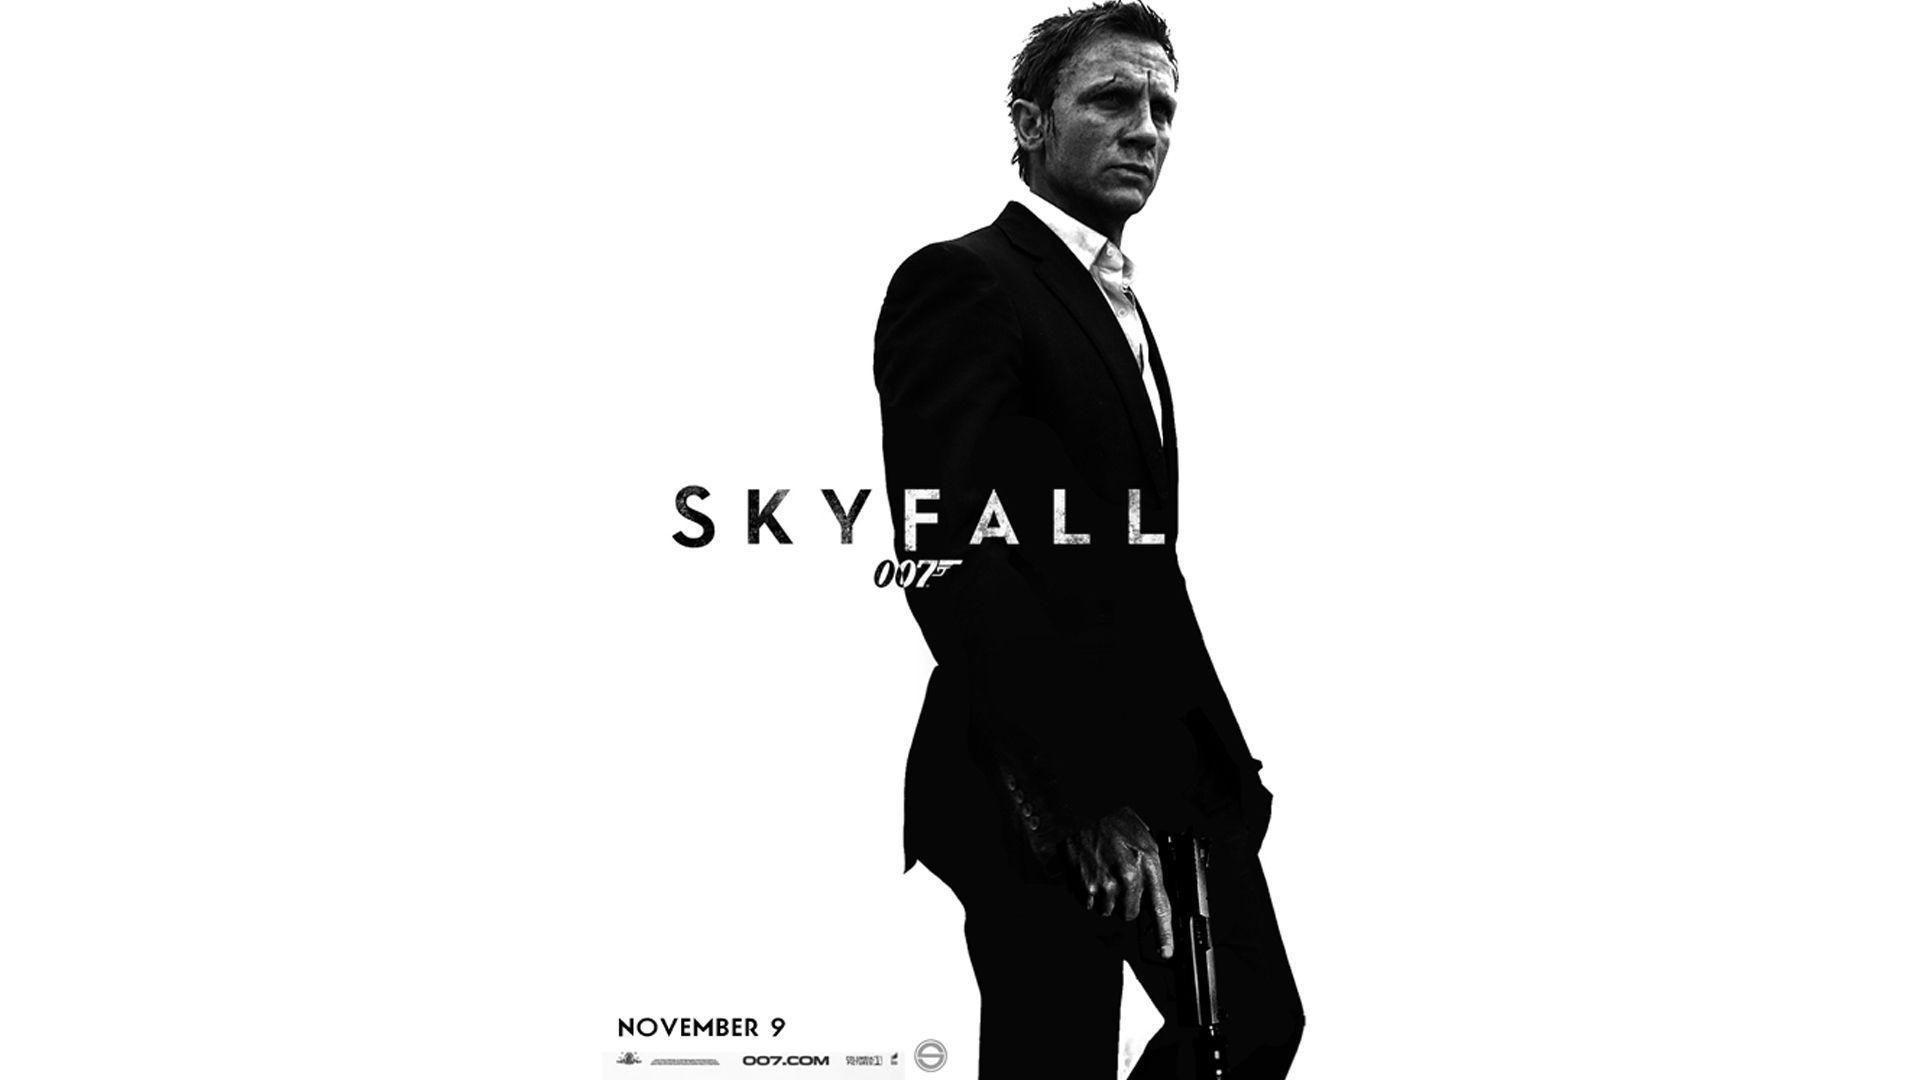 James Bond Daniel Craig Wallpapers Wallpaper Cave Daniel Craig James Bond James Bond Movies James Bond Skyfall